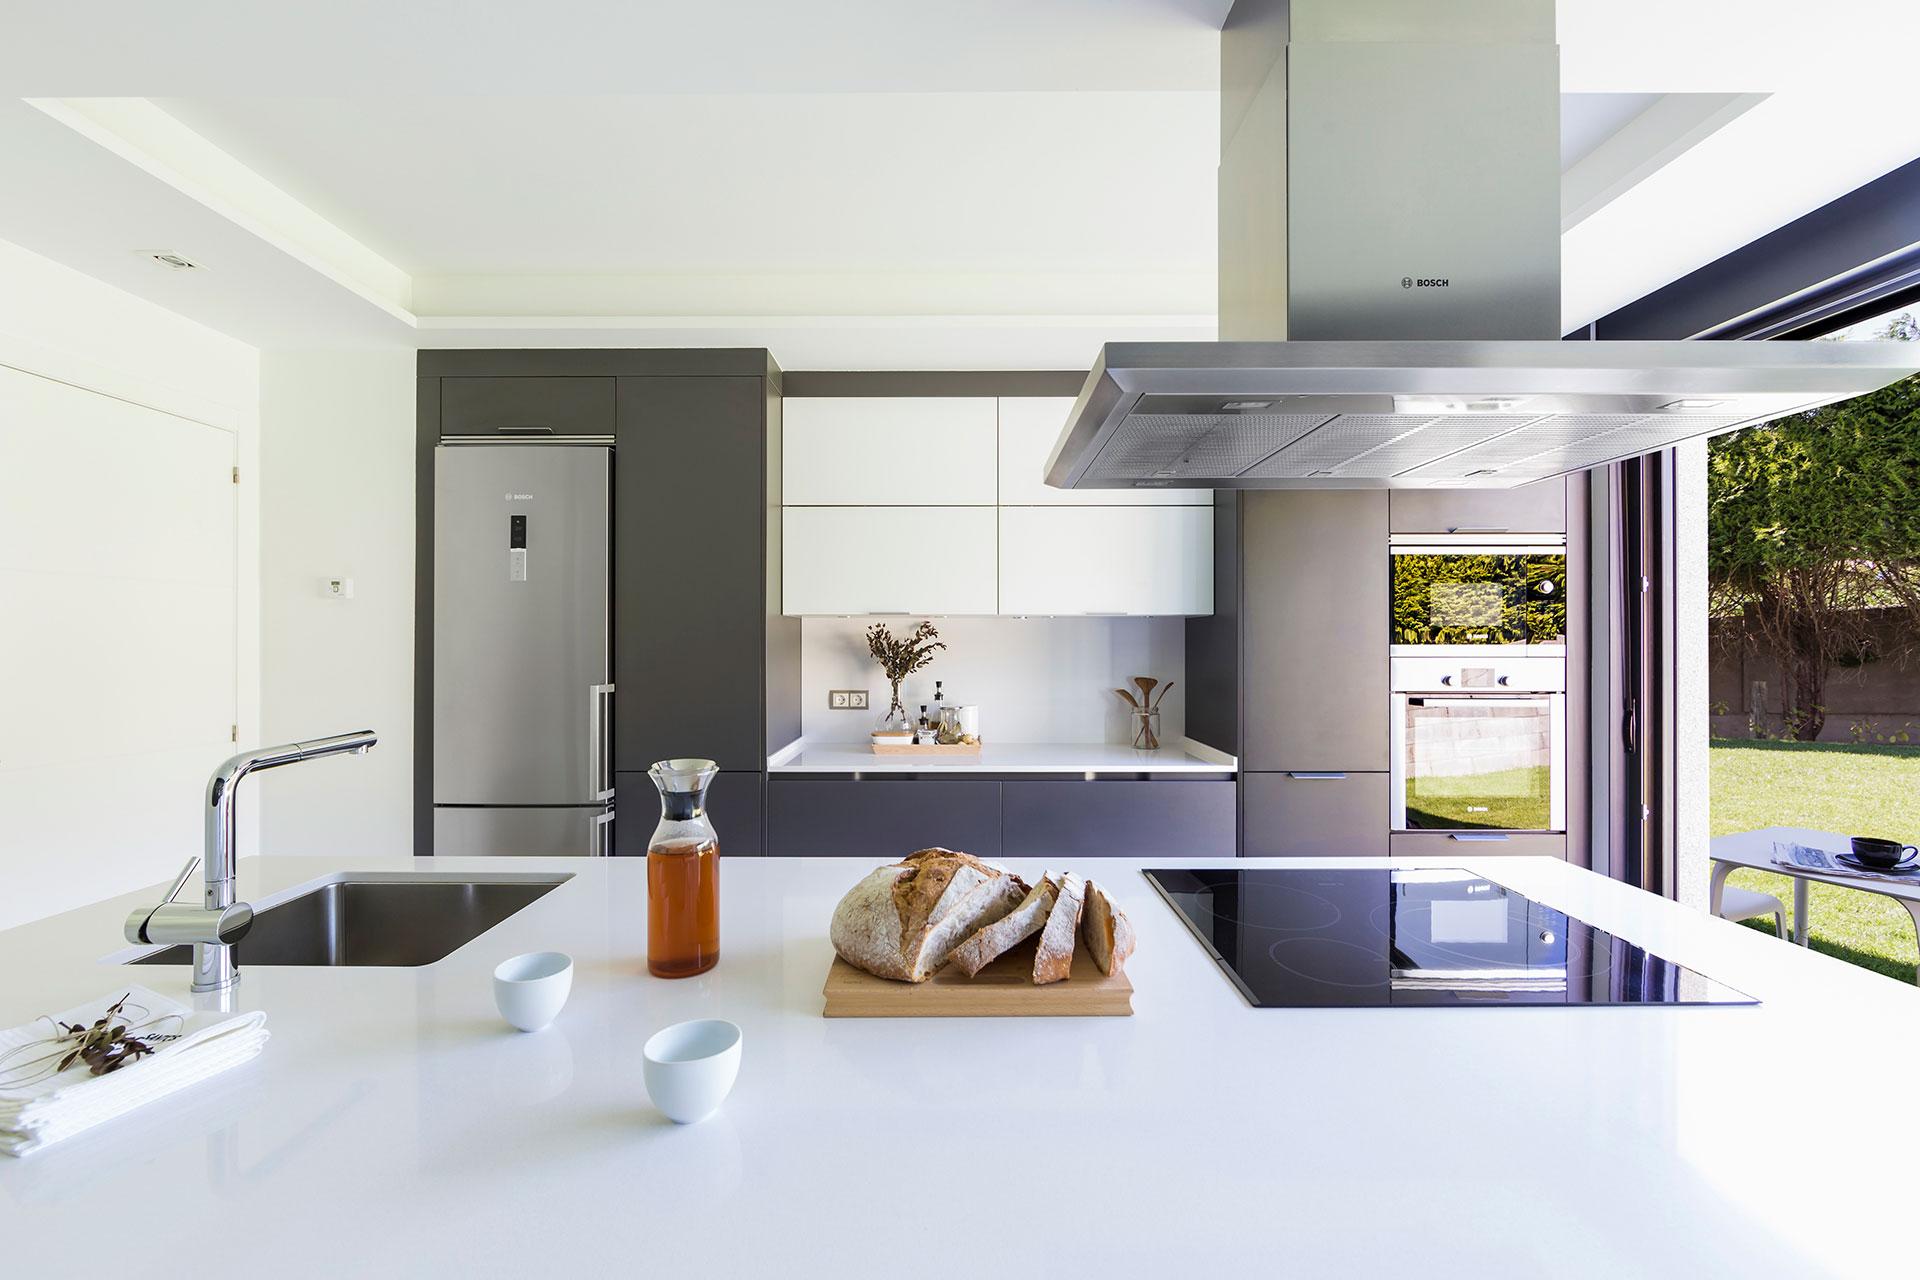 Campanas extractoras de cocina c mo acertar cocinas santos santiago interiores - Campanas extractoras de cocina silenciosas ...